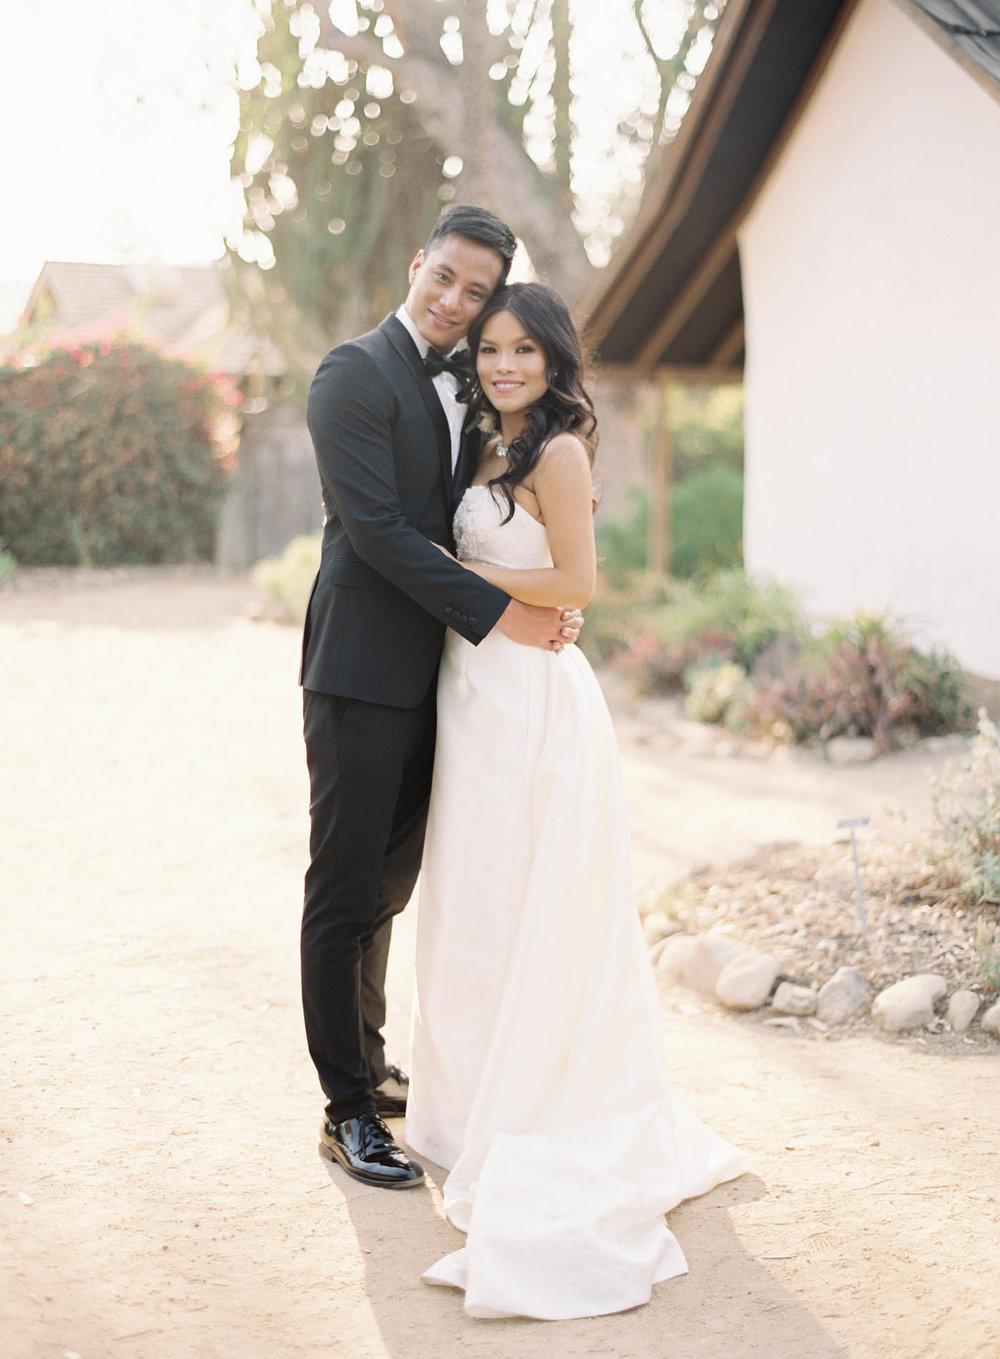 franciscan-gardens-wedding-15-Jen_Huang-000762-R1-014.jpg